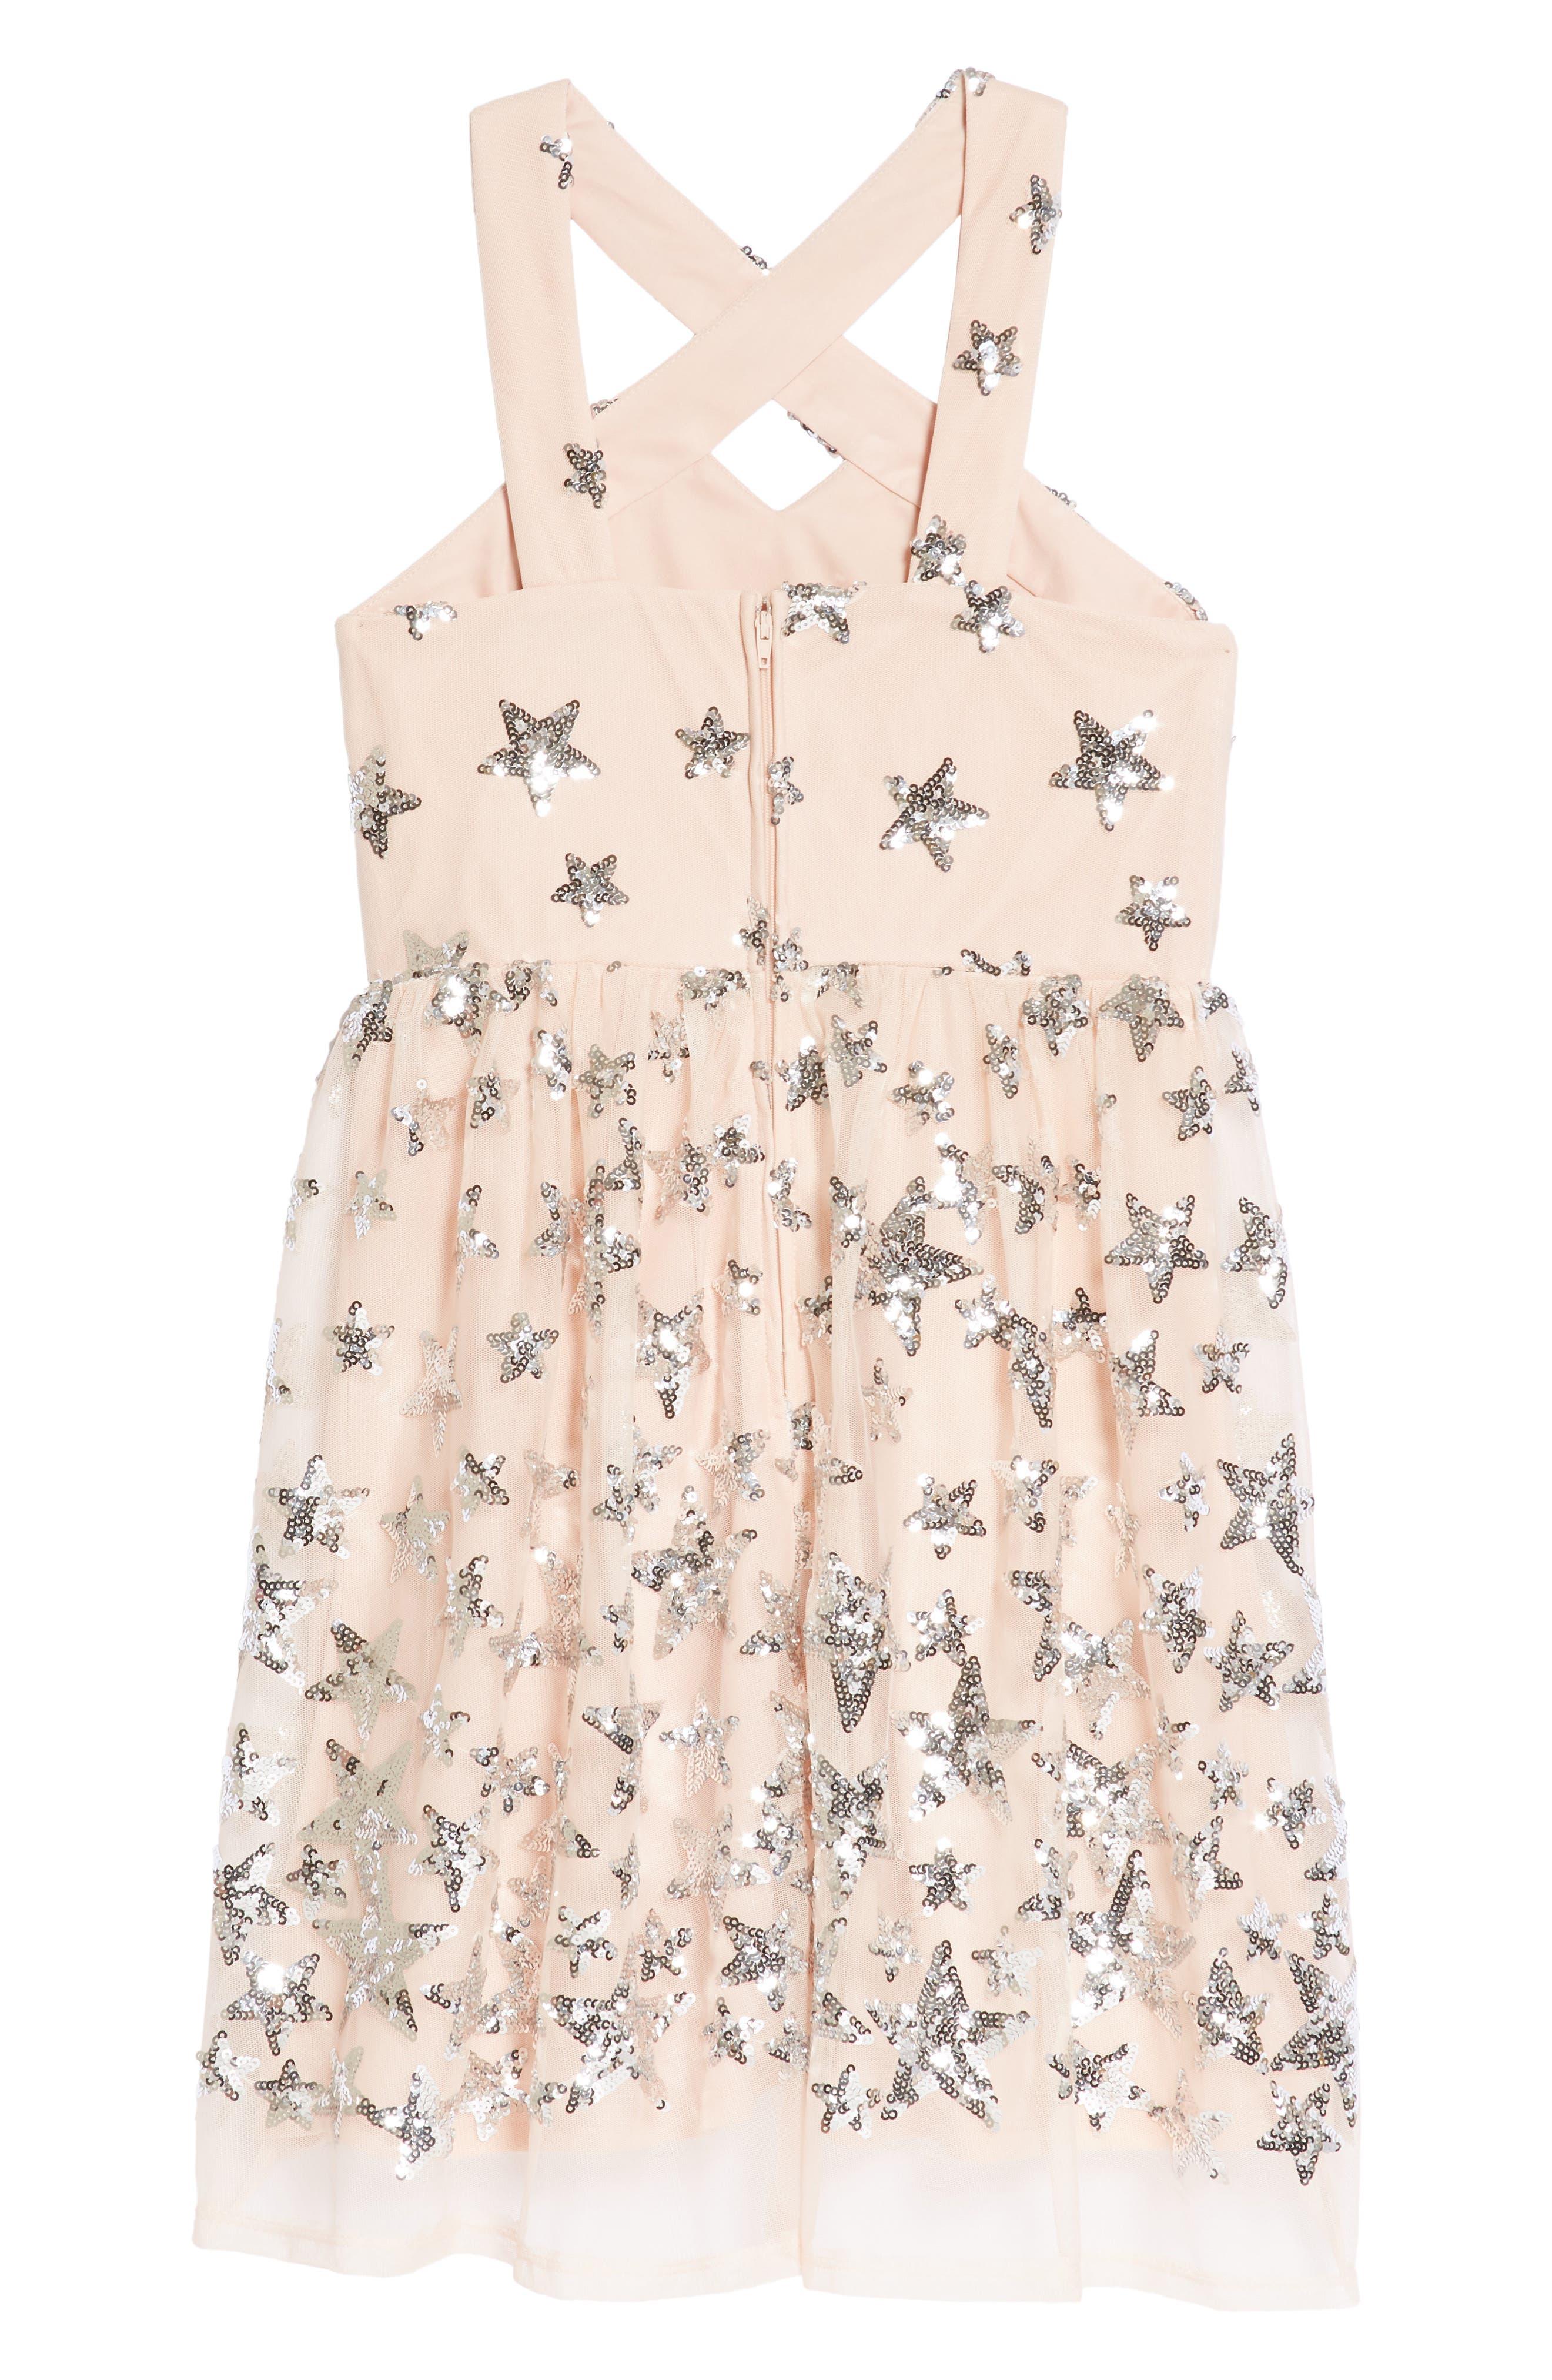 Sequin Embellished Star Party Dress,                             Alternate thumbnail 2, color,                             Blush